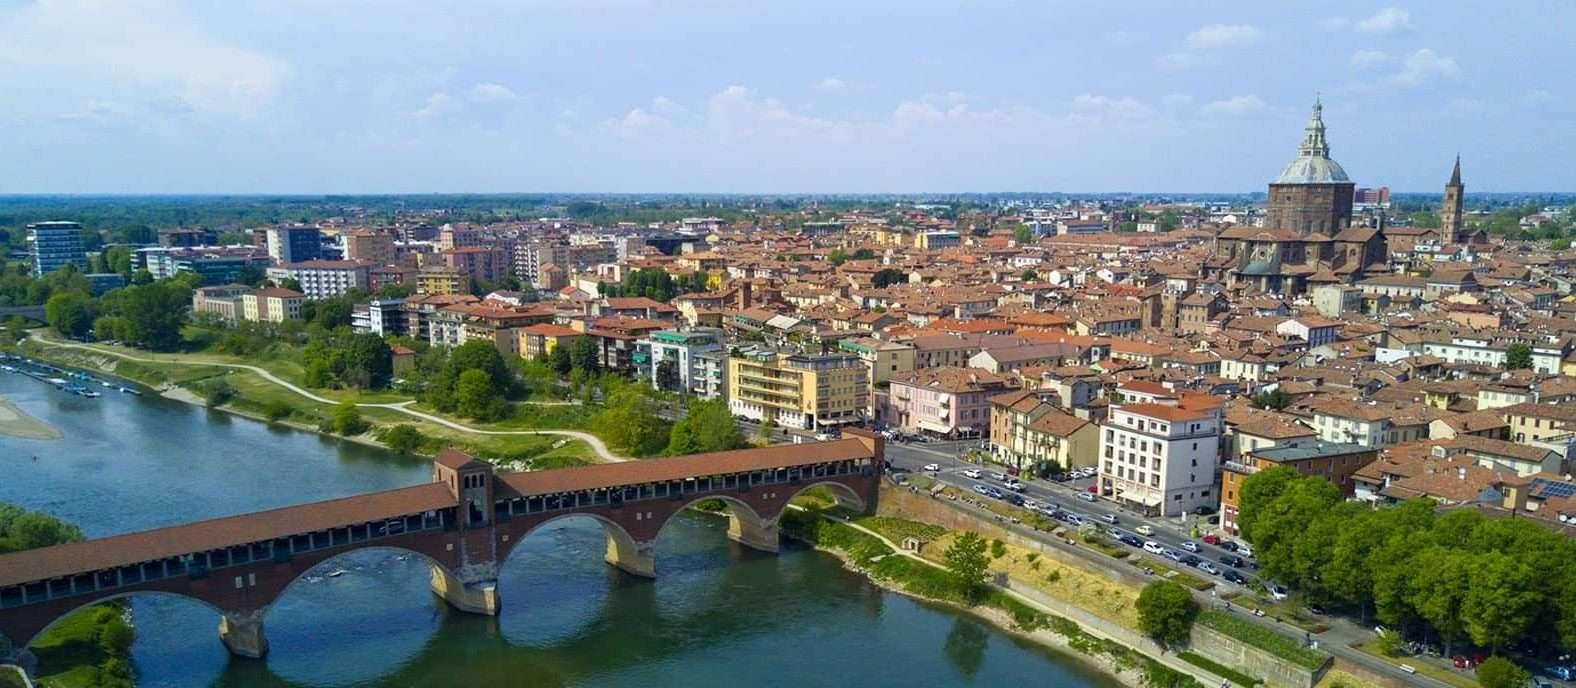 Pavia - © Vaghis - viaggi & turismo Italia - Tutti i diritti riservati